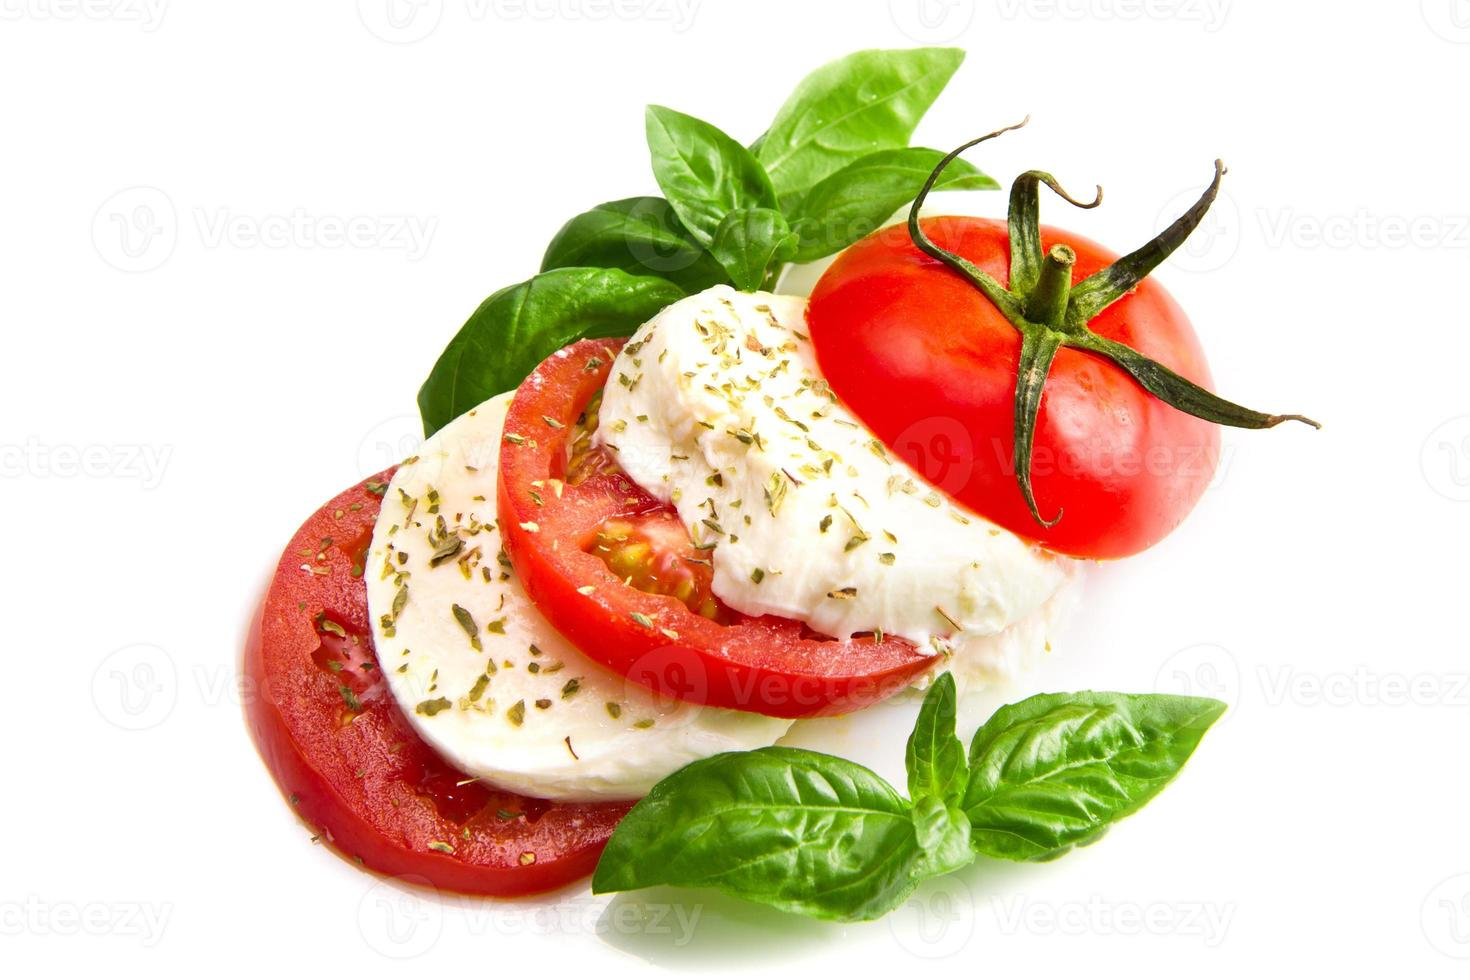 Tomato and mozzarella with basil leaves on white photo